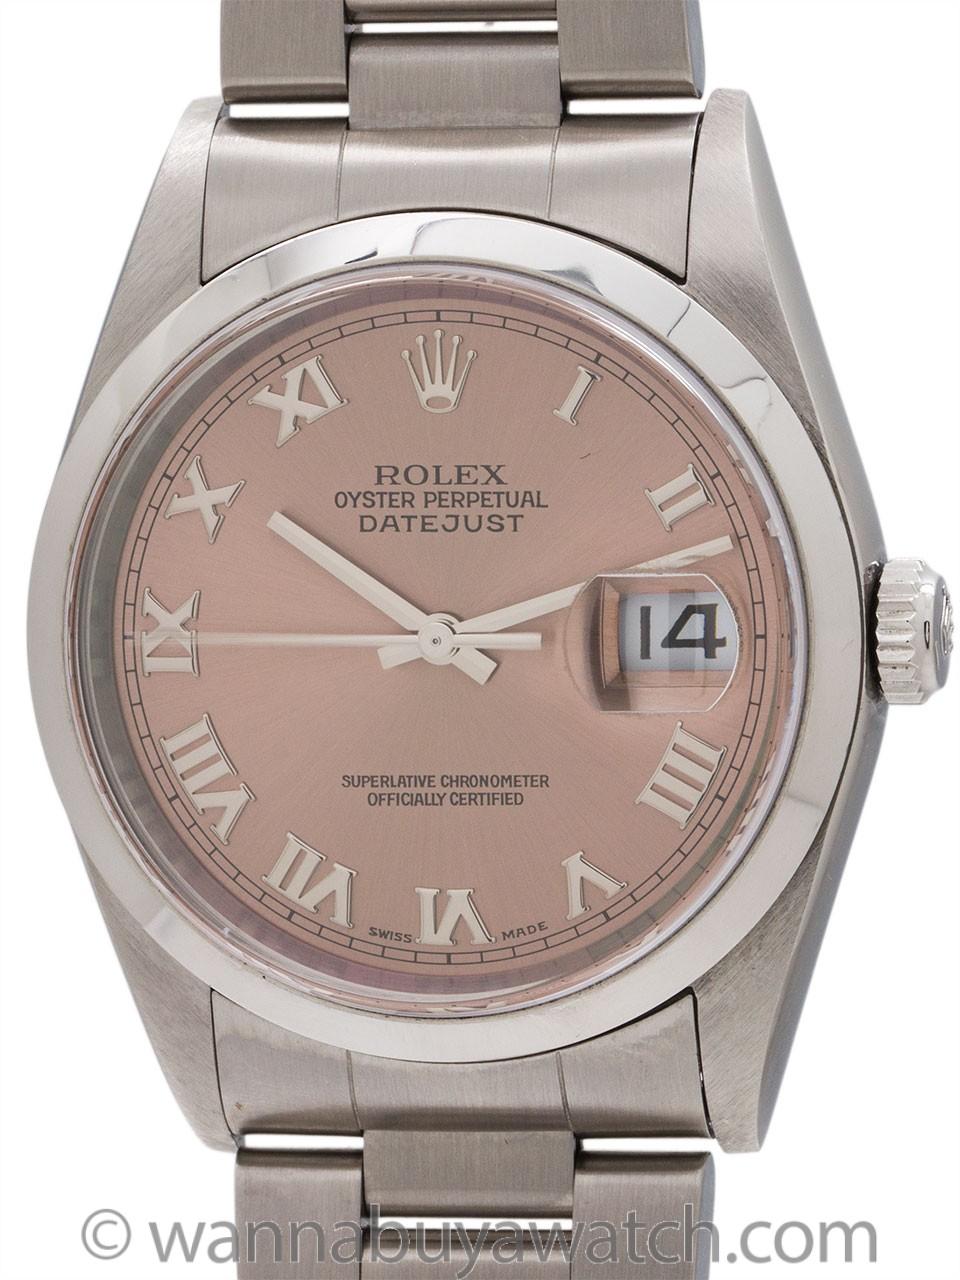 Rolex SS Datejust Salmon Dial circa 1996